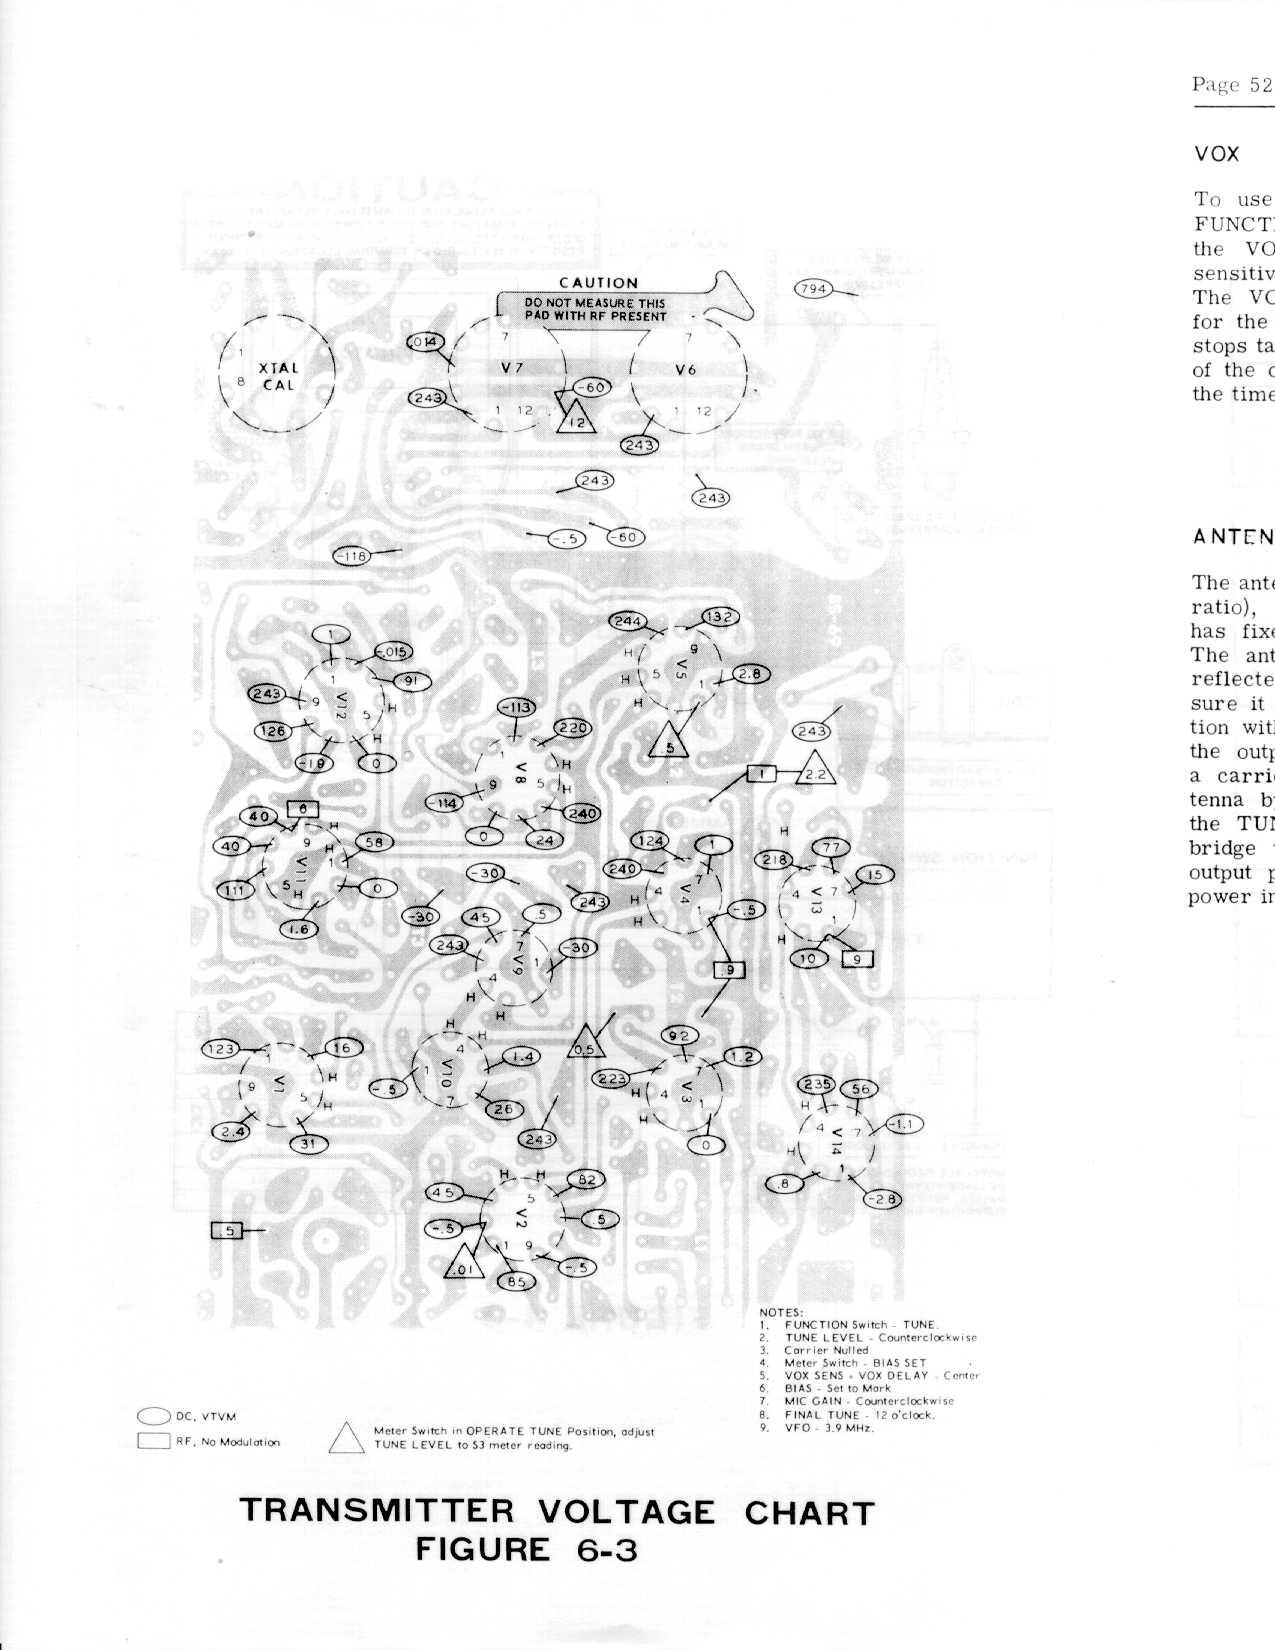 Index of /Heath_Manual_Collection/Heath_Manuals_HW-HX/HW-22a